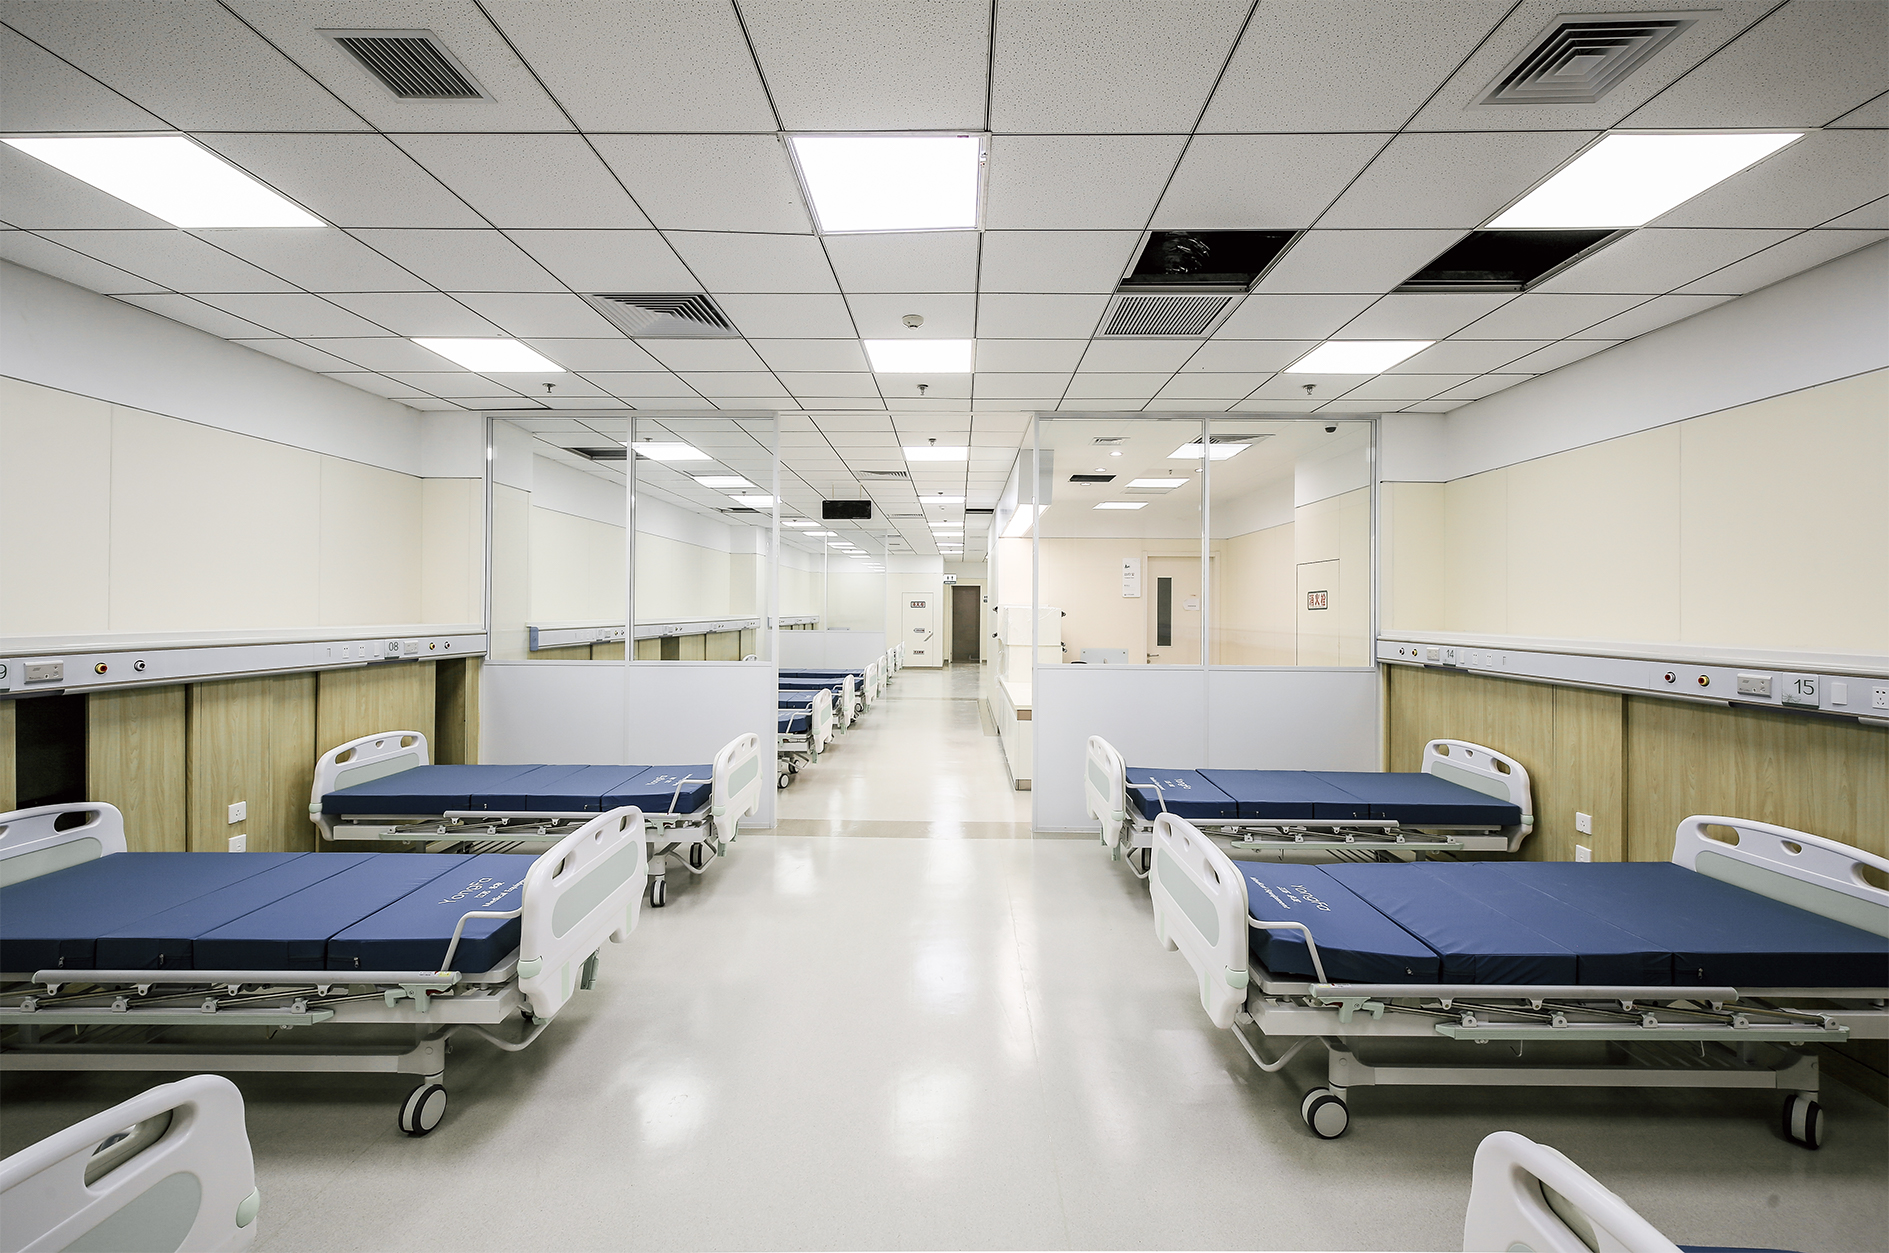 SuzhouNew District Hospital